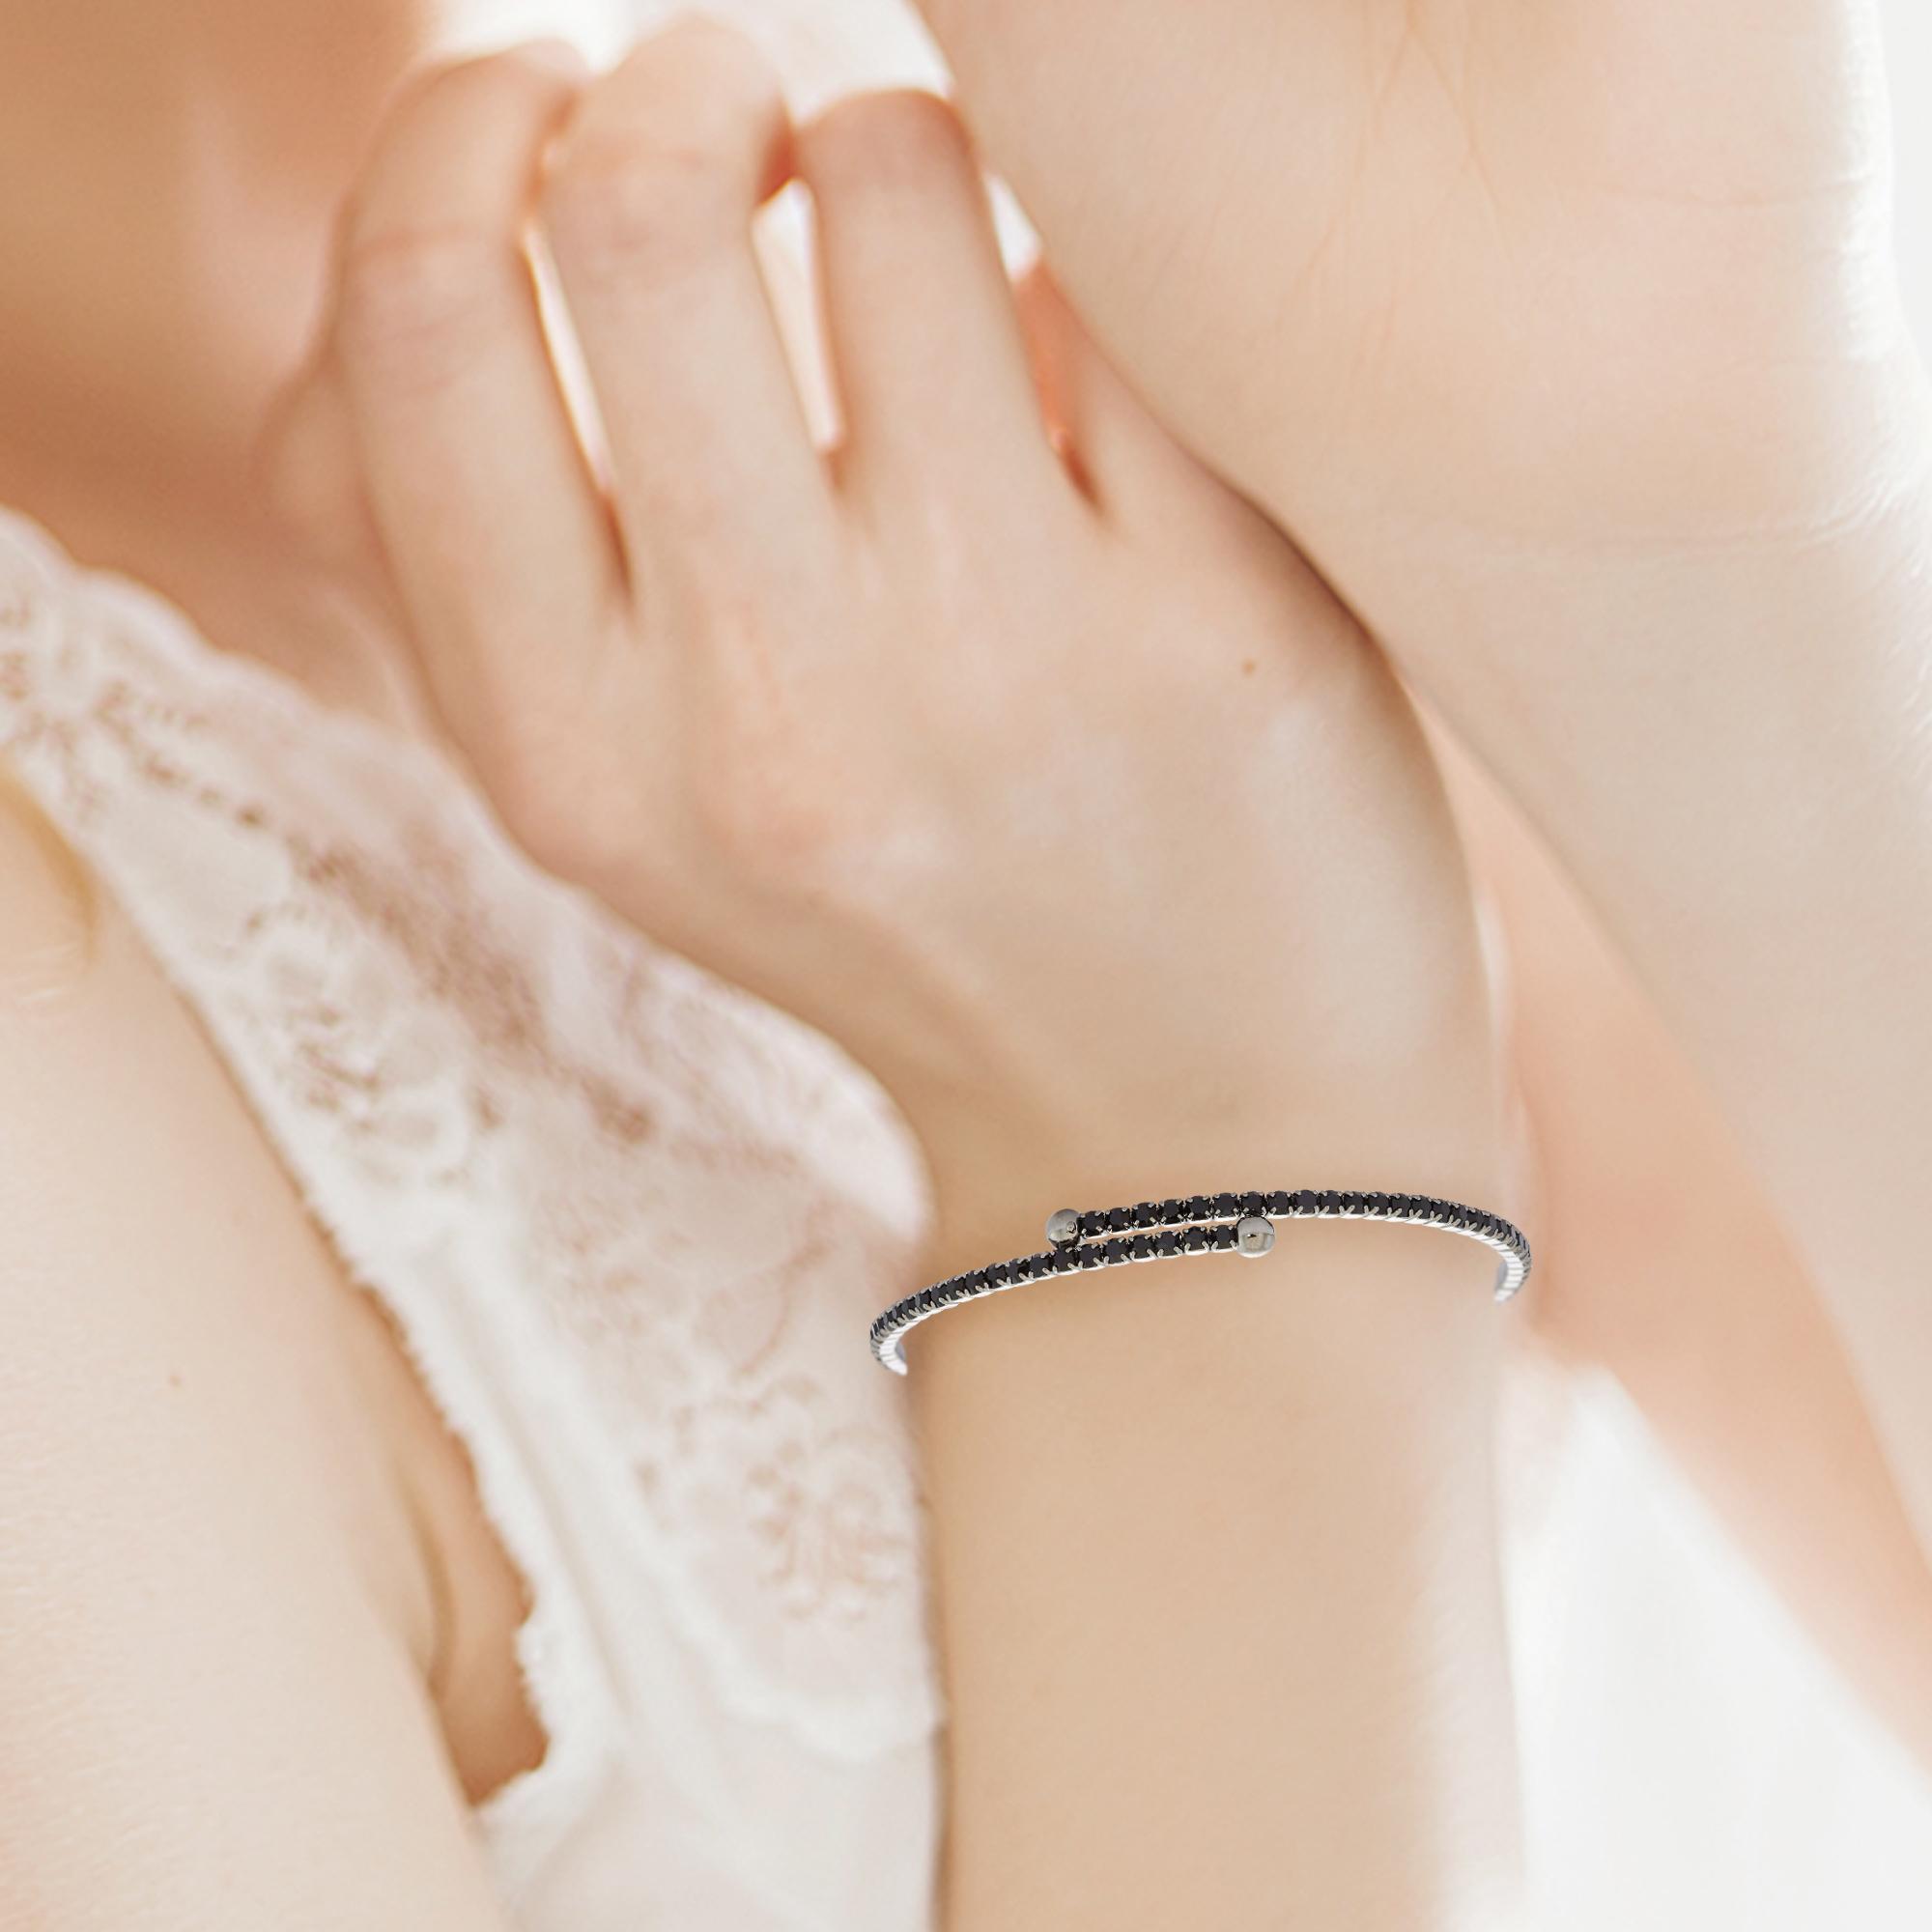 Womens-Ladies-Fashion-Accessories-Jewelry-Black-Rhodium-Plated-Bangle-Bracelet thumbnail 21